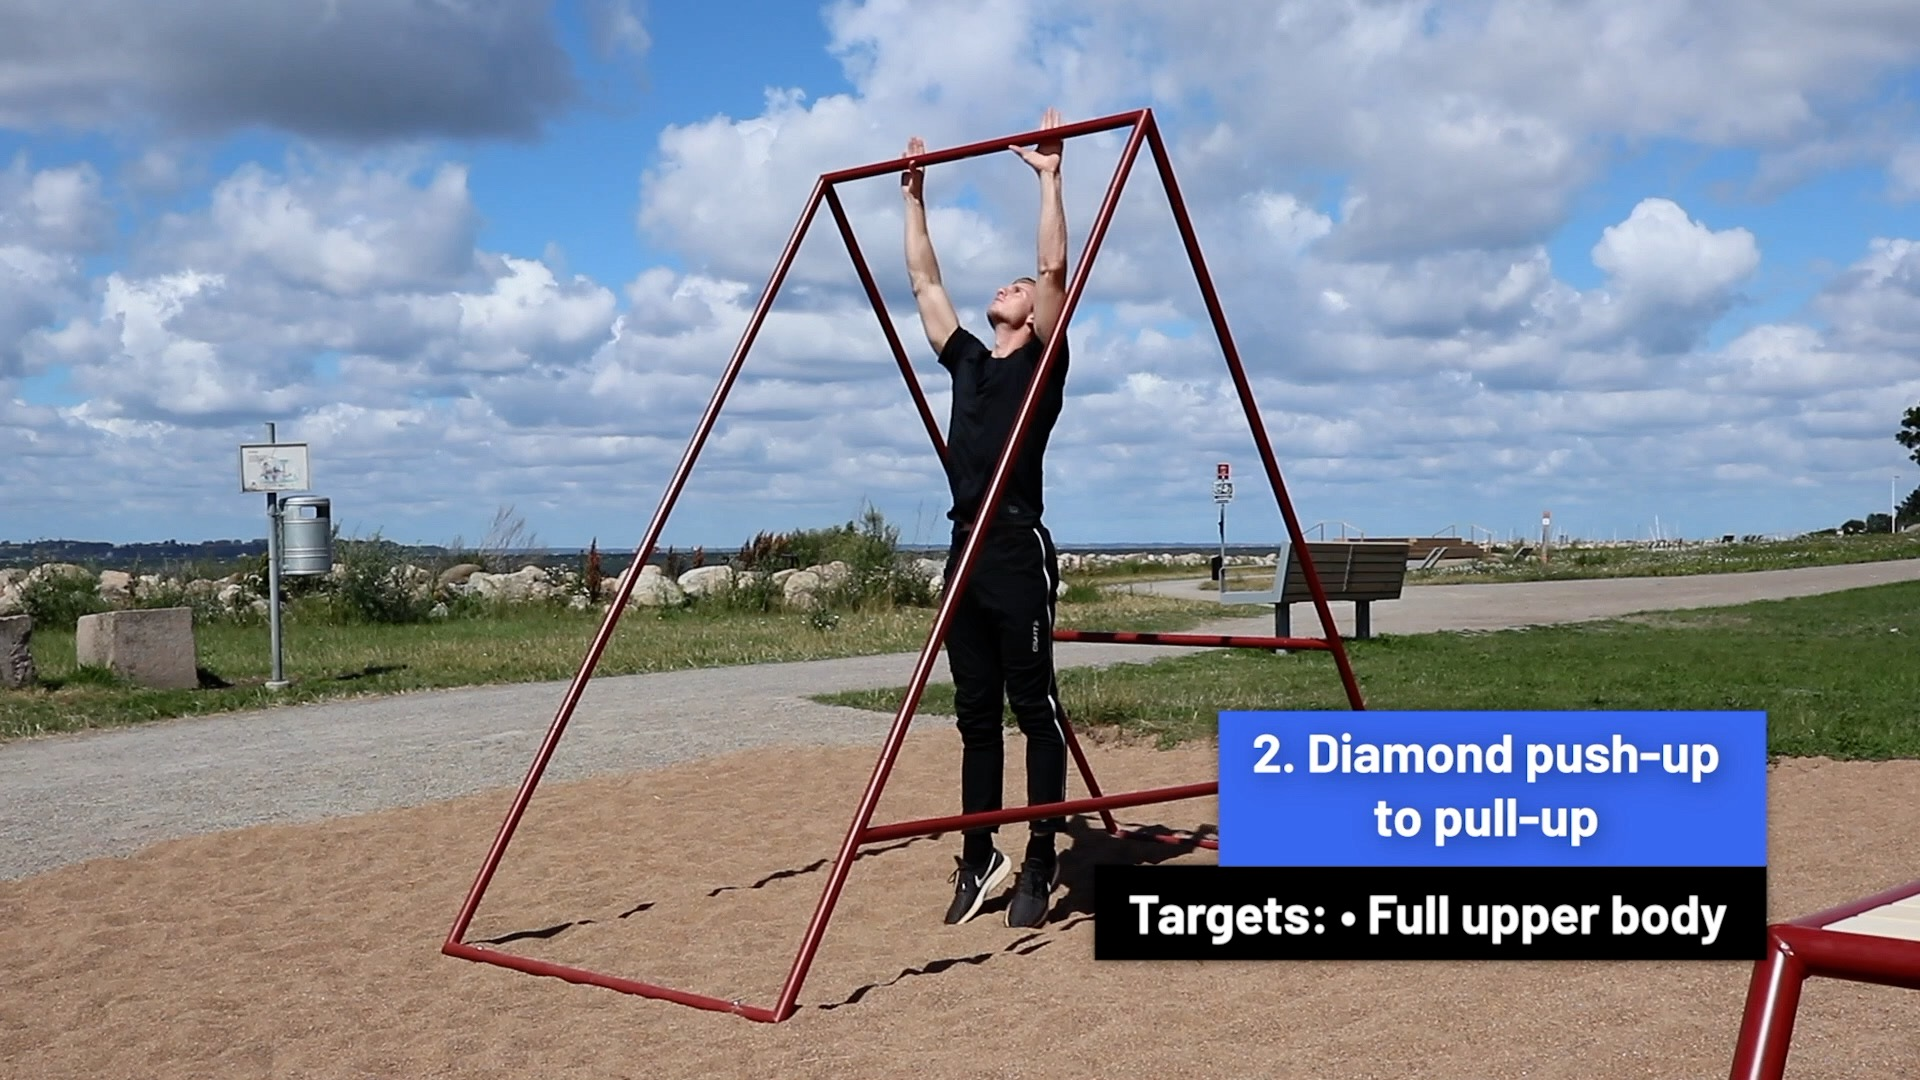 Diamond push-up to pull-up